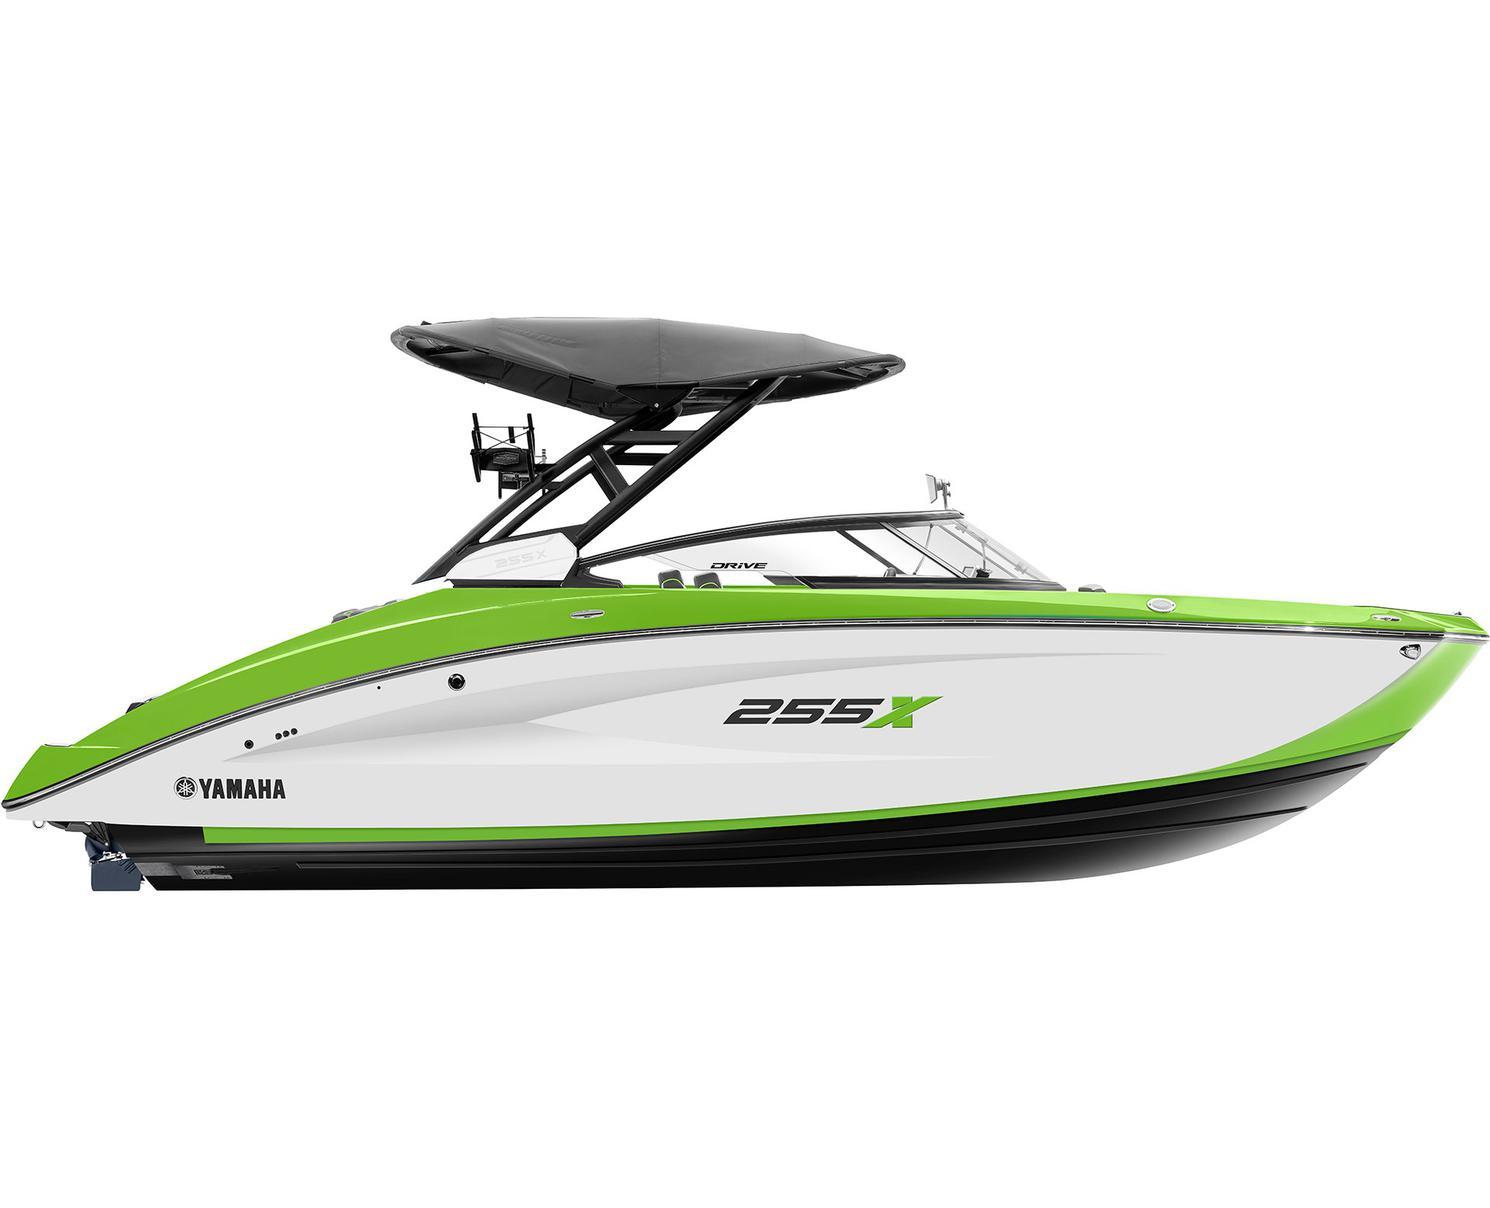 Yamaha 255XD Blanc/Vert Citron 2022